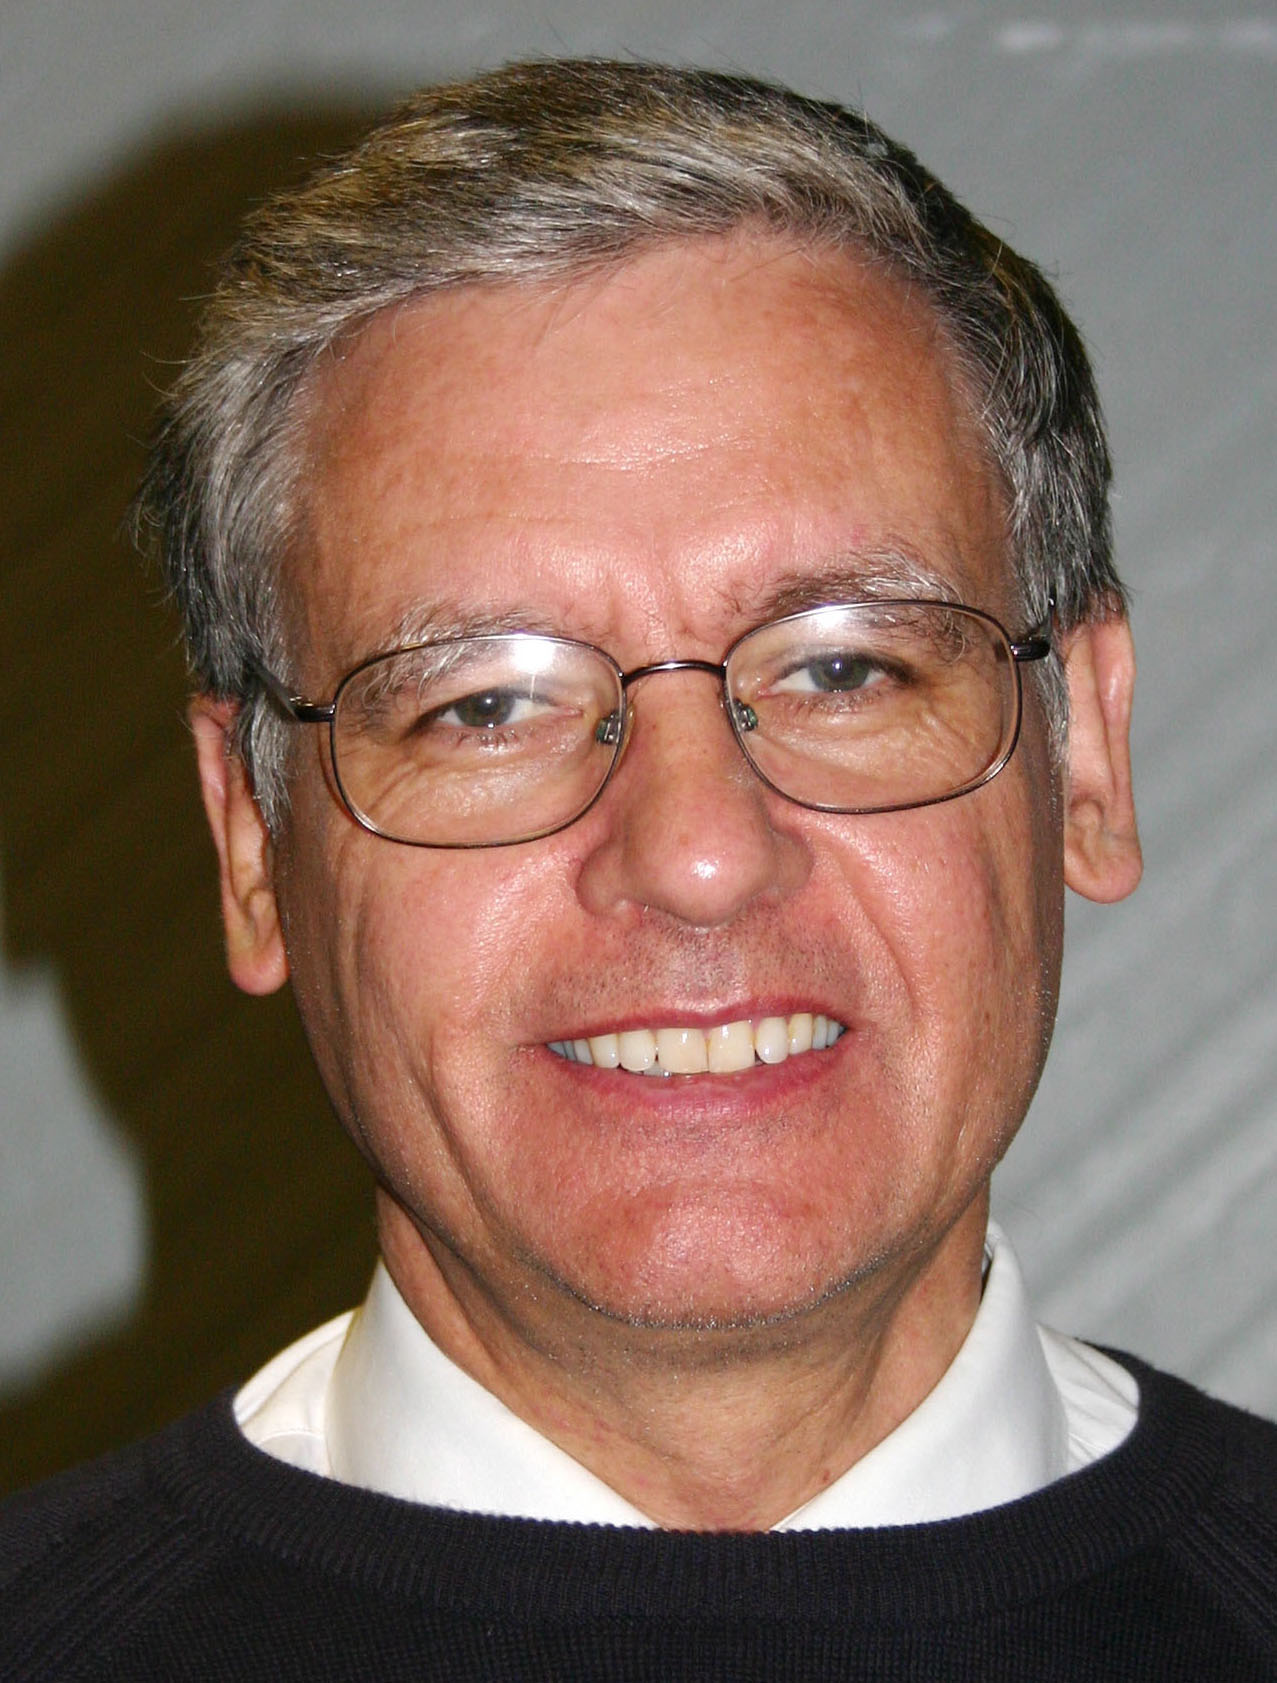 B1 - Alan Clare